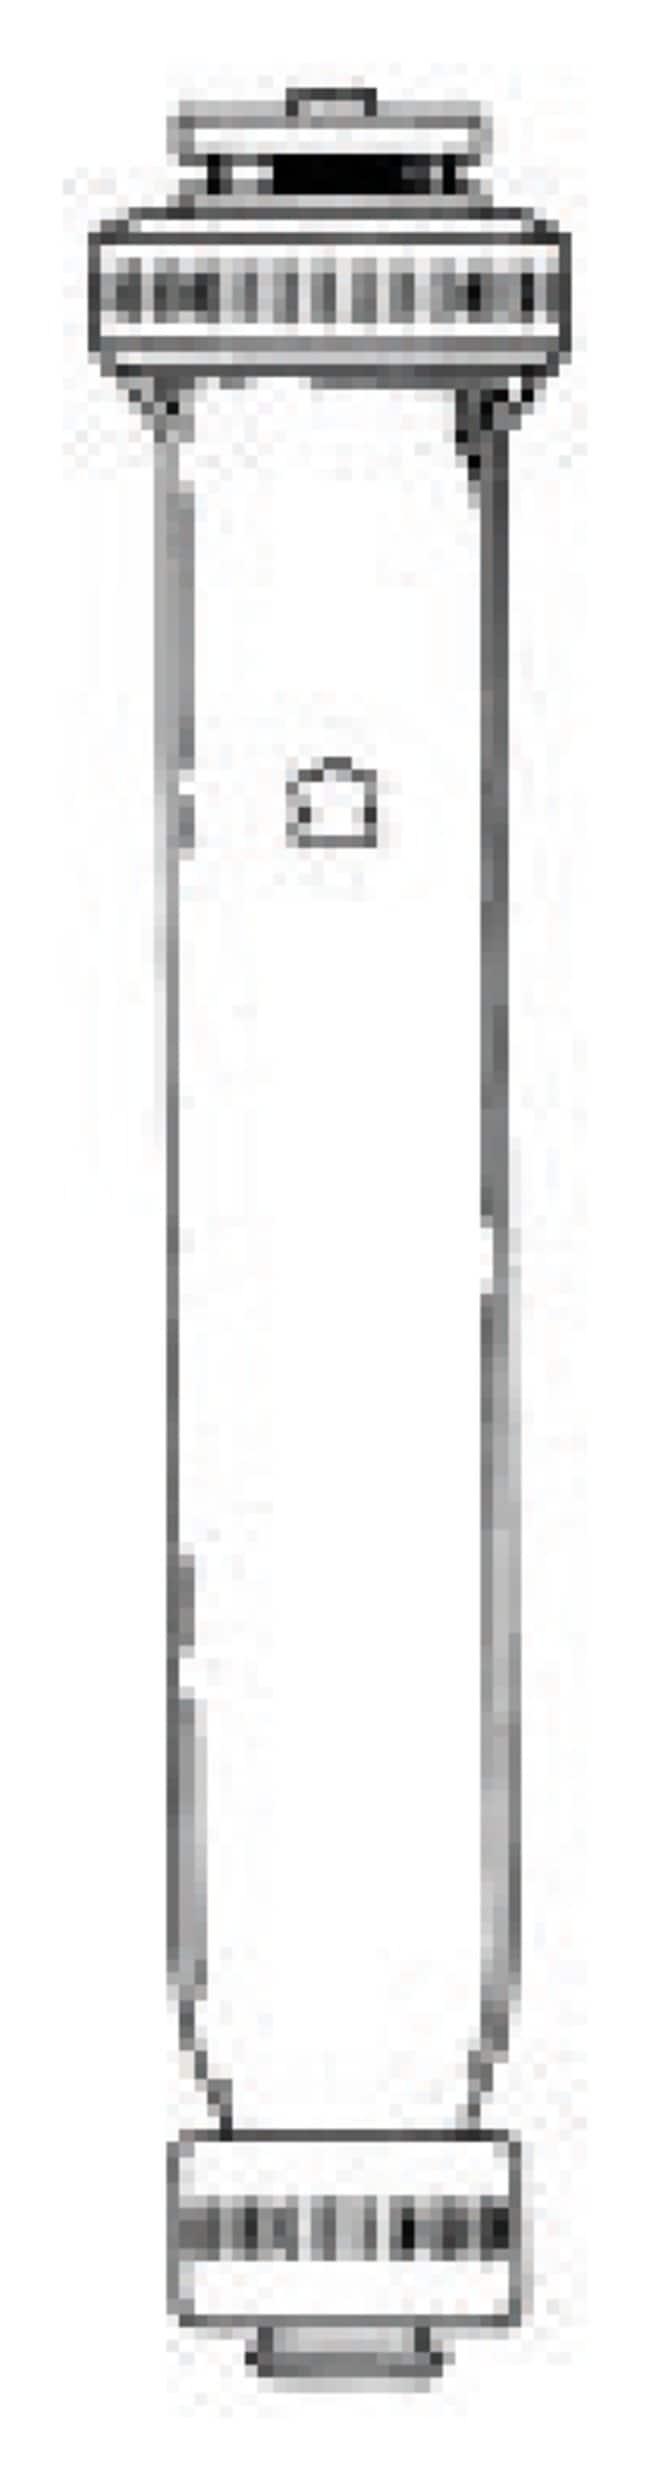 DWK Life SciencesKimble™ Kontes™ Packing Reservoir for CHROMAFLEX™ Columns